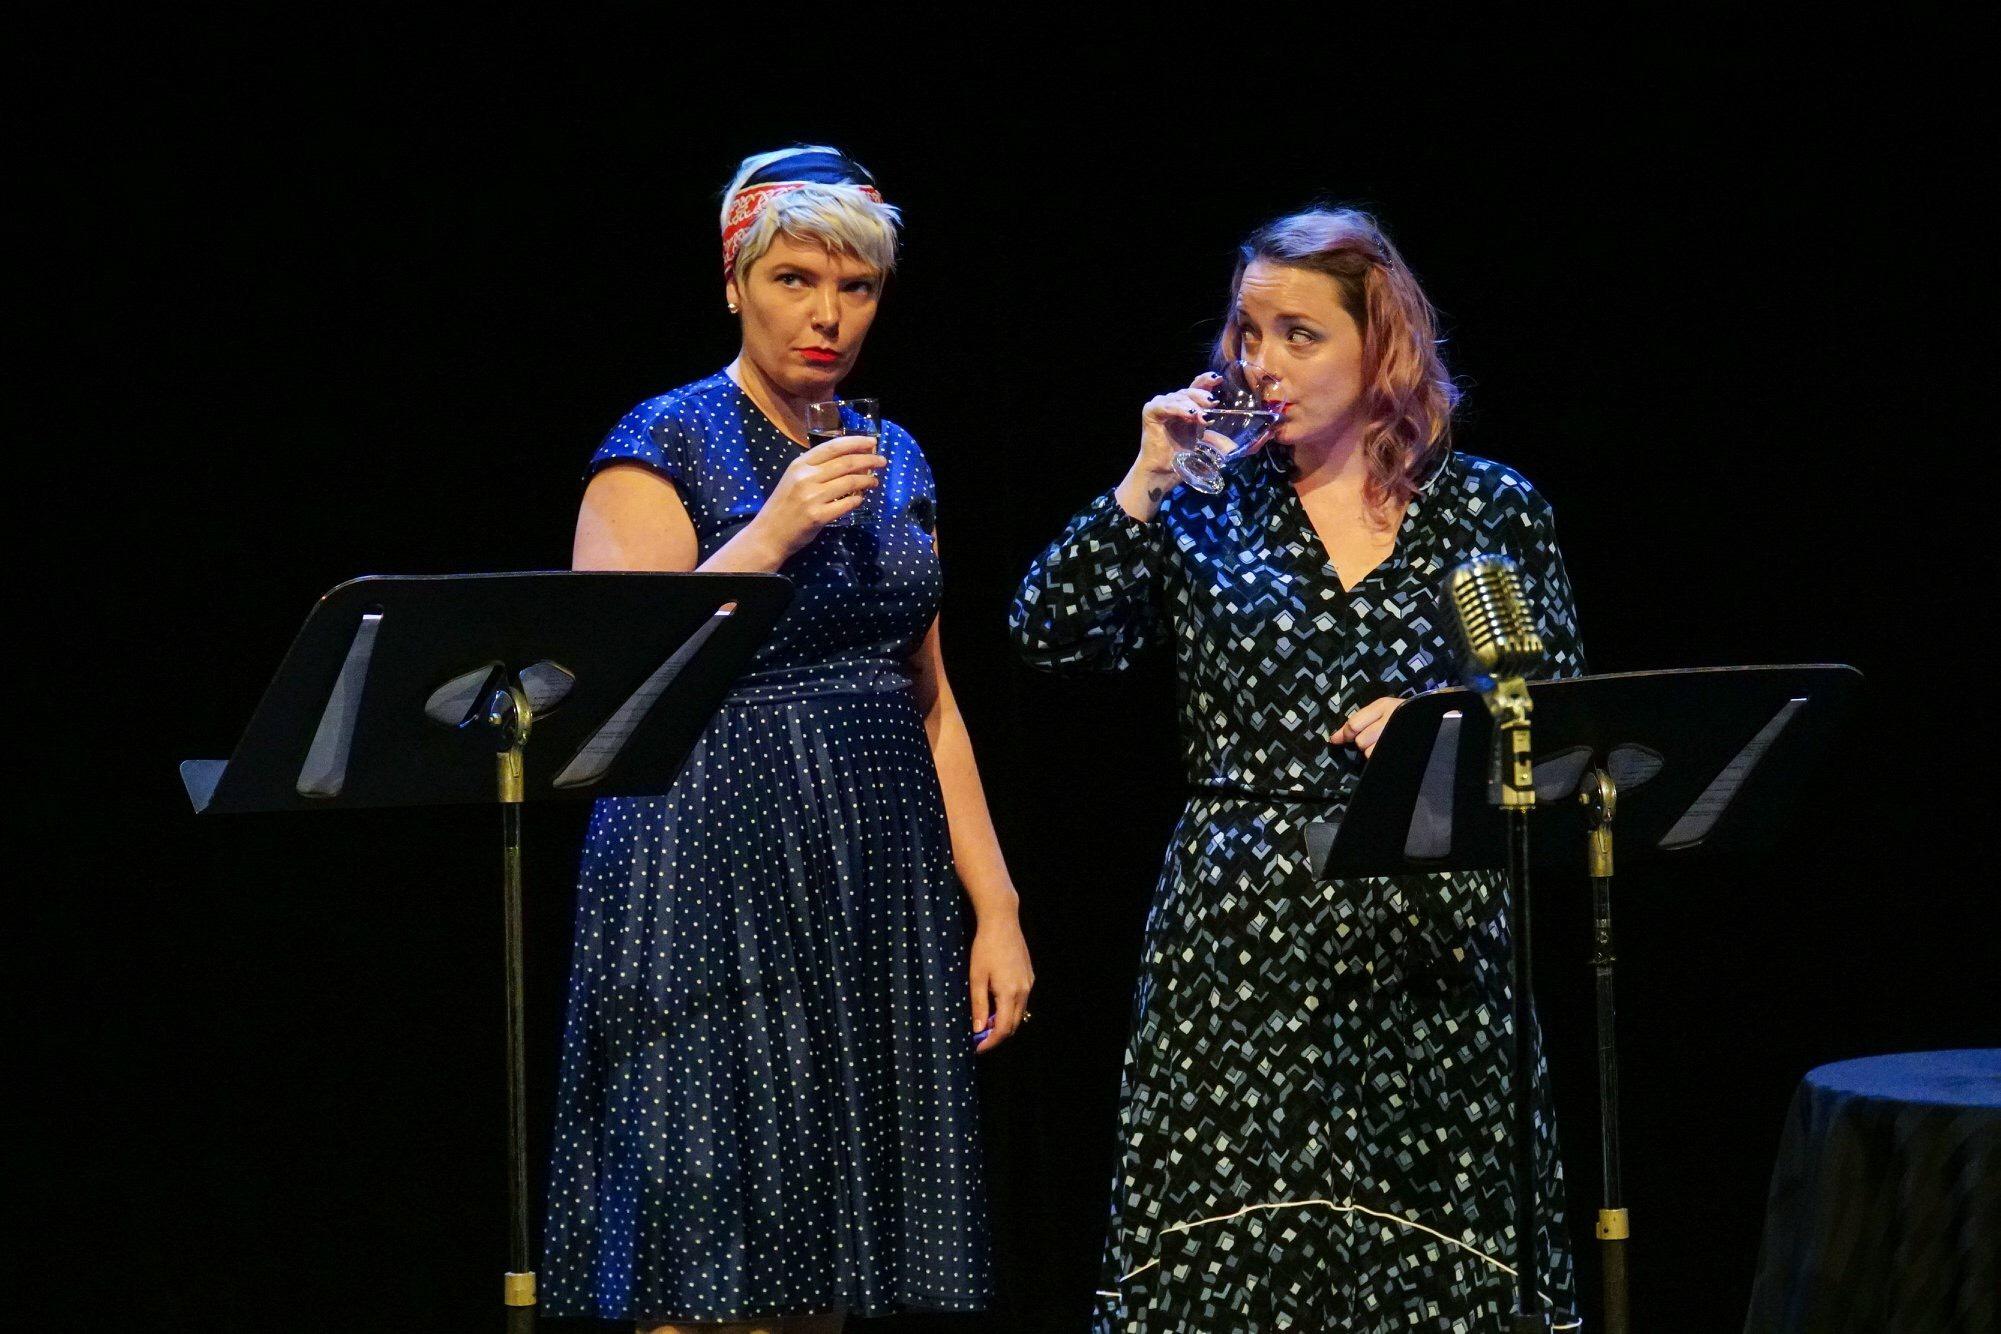 Lynn Panting and Thea Morash